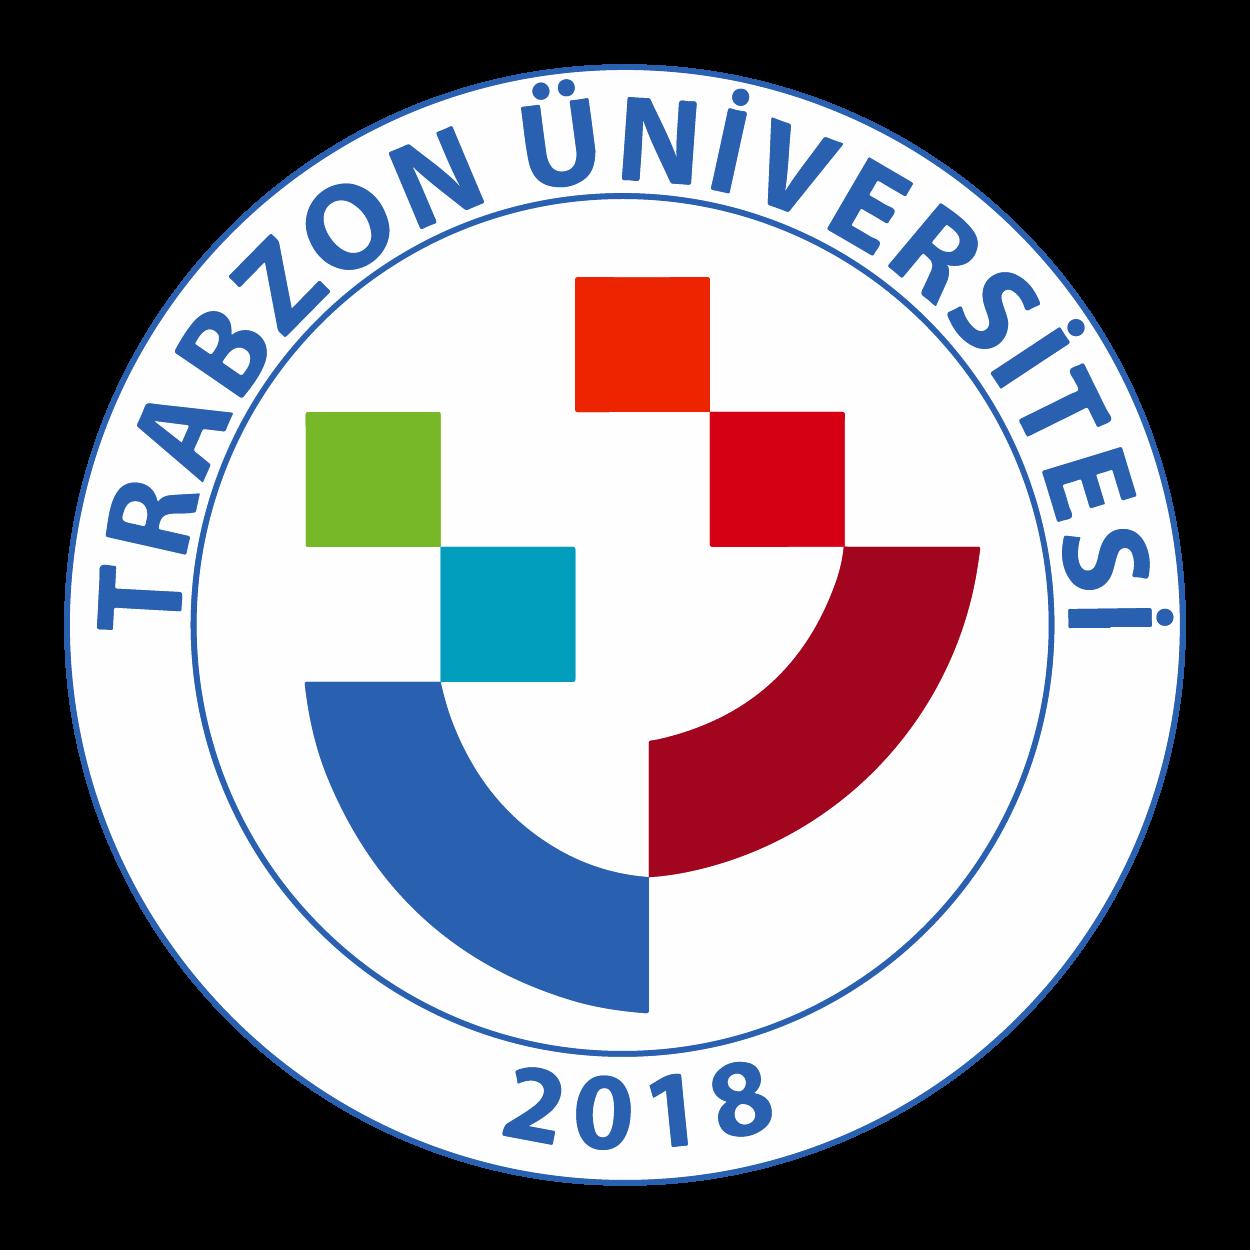 Trabzon Üniversitesi Logo png